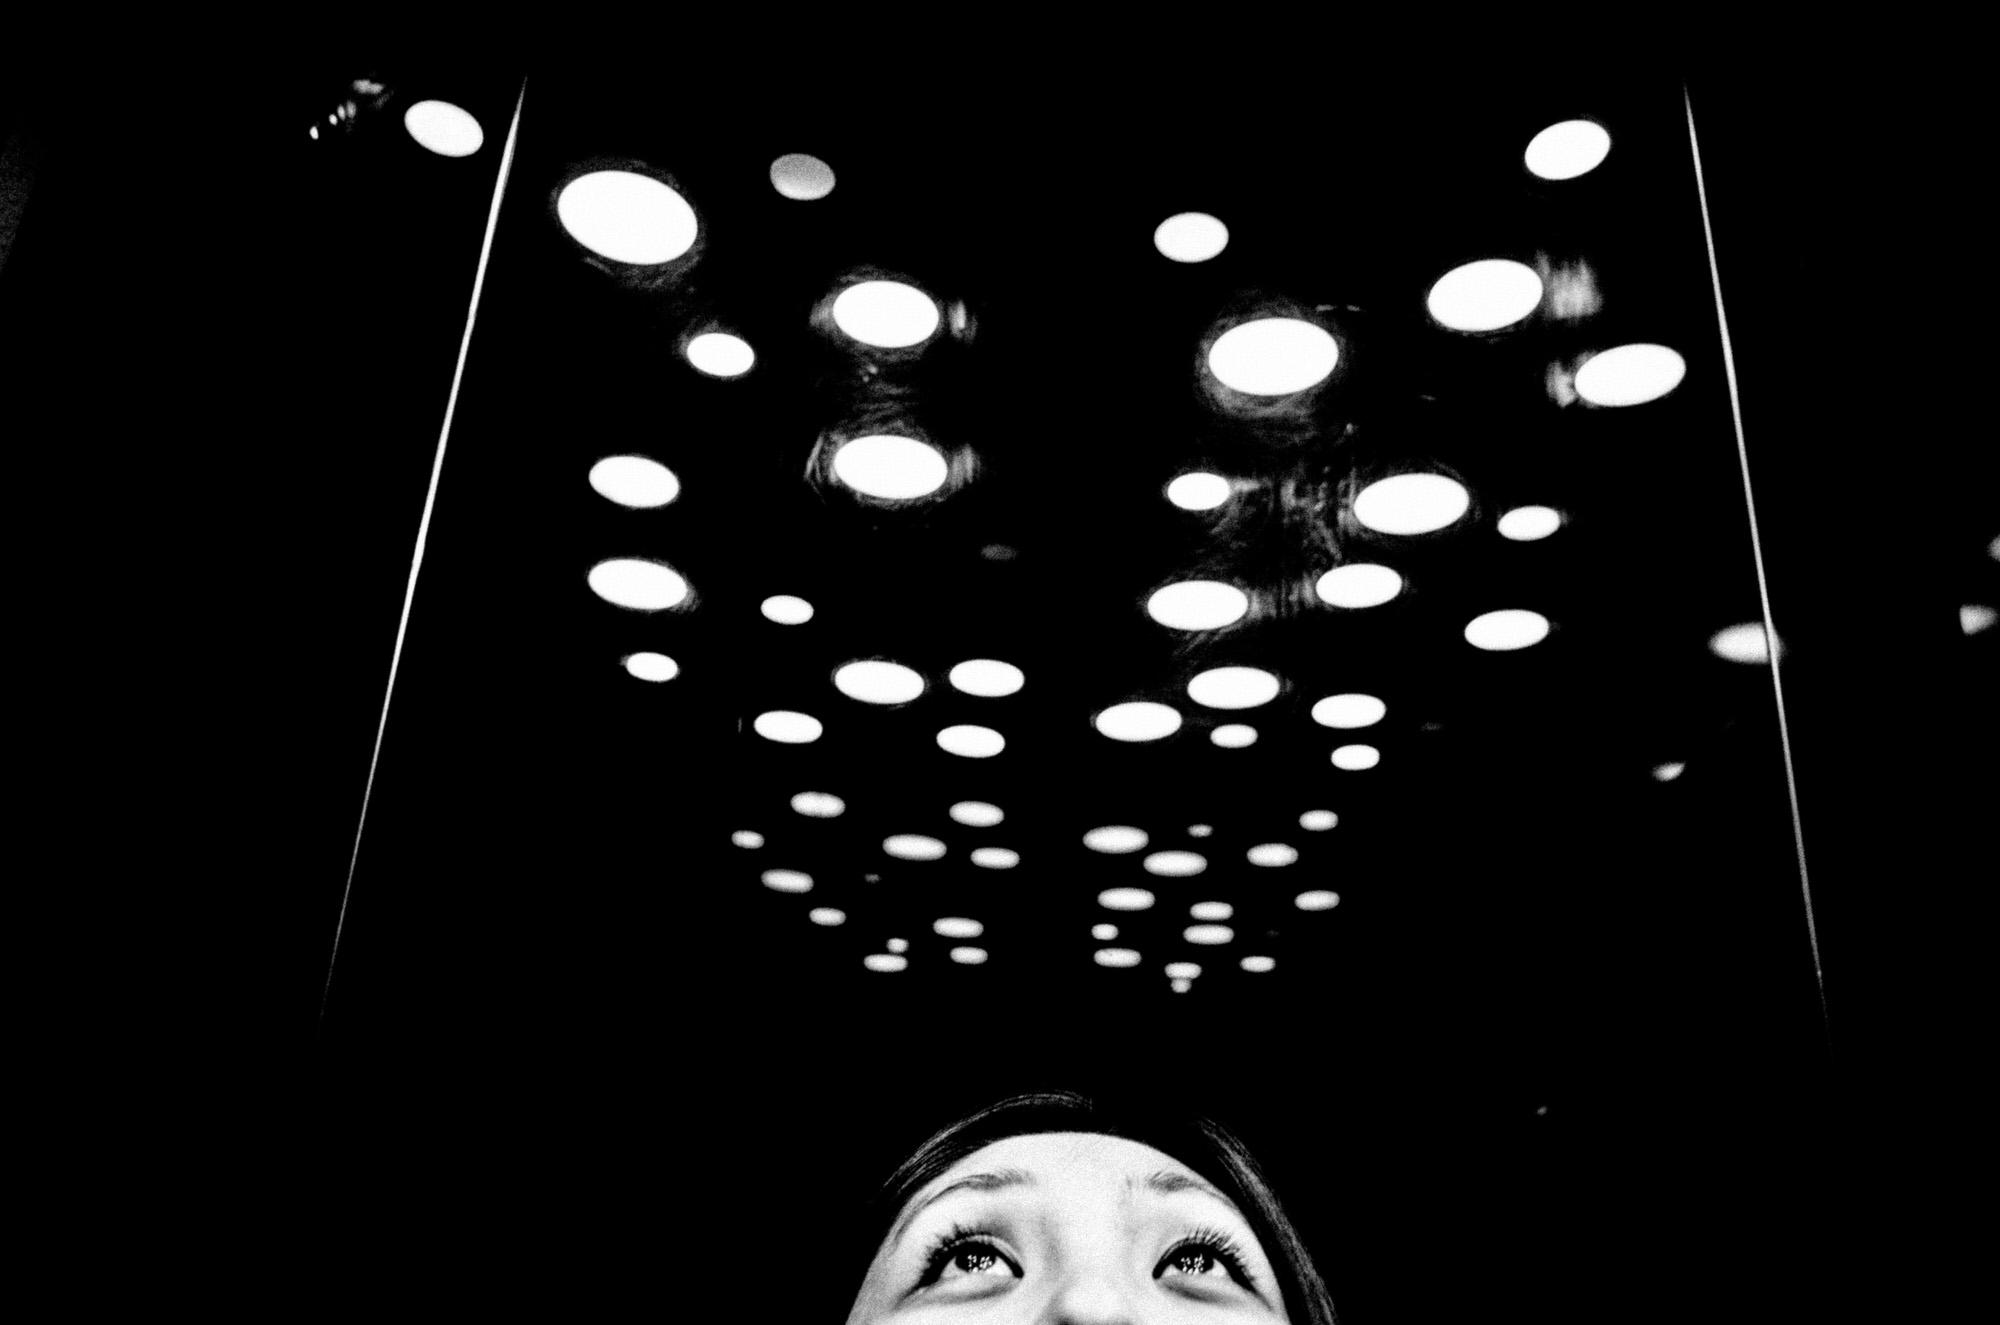 eric kim photography black and white - eric kim black and white street photography hanoi-0012213-2-PICK